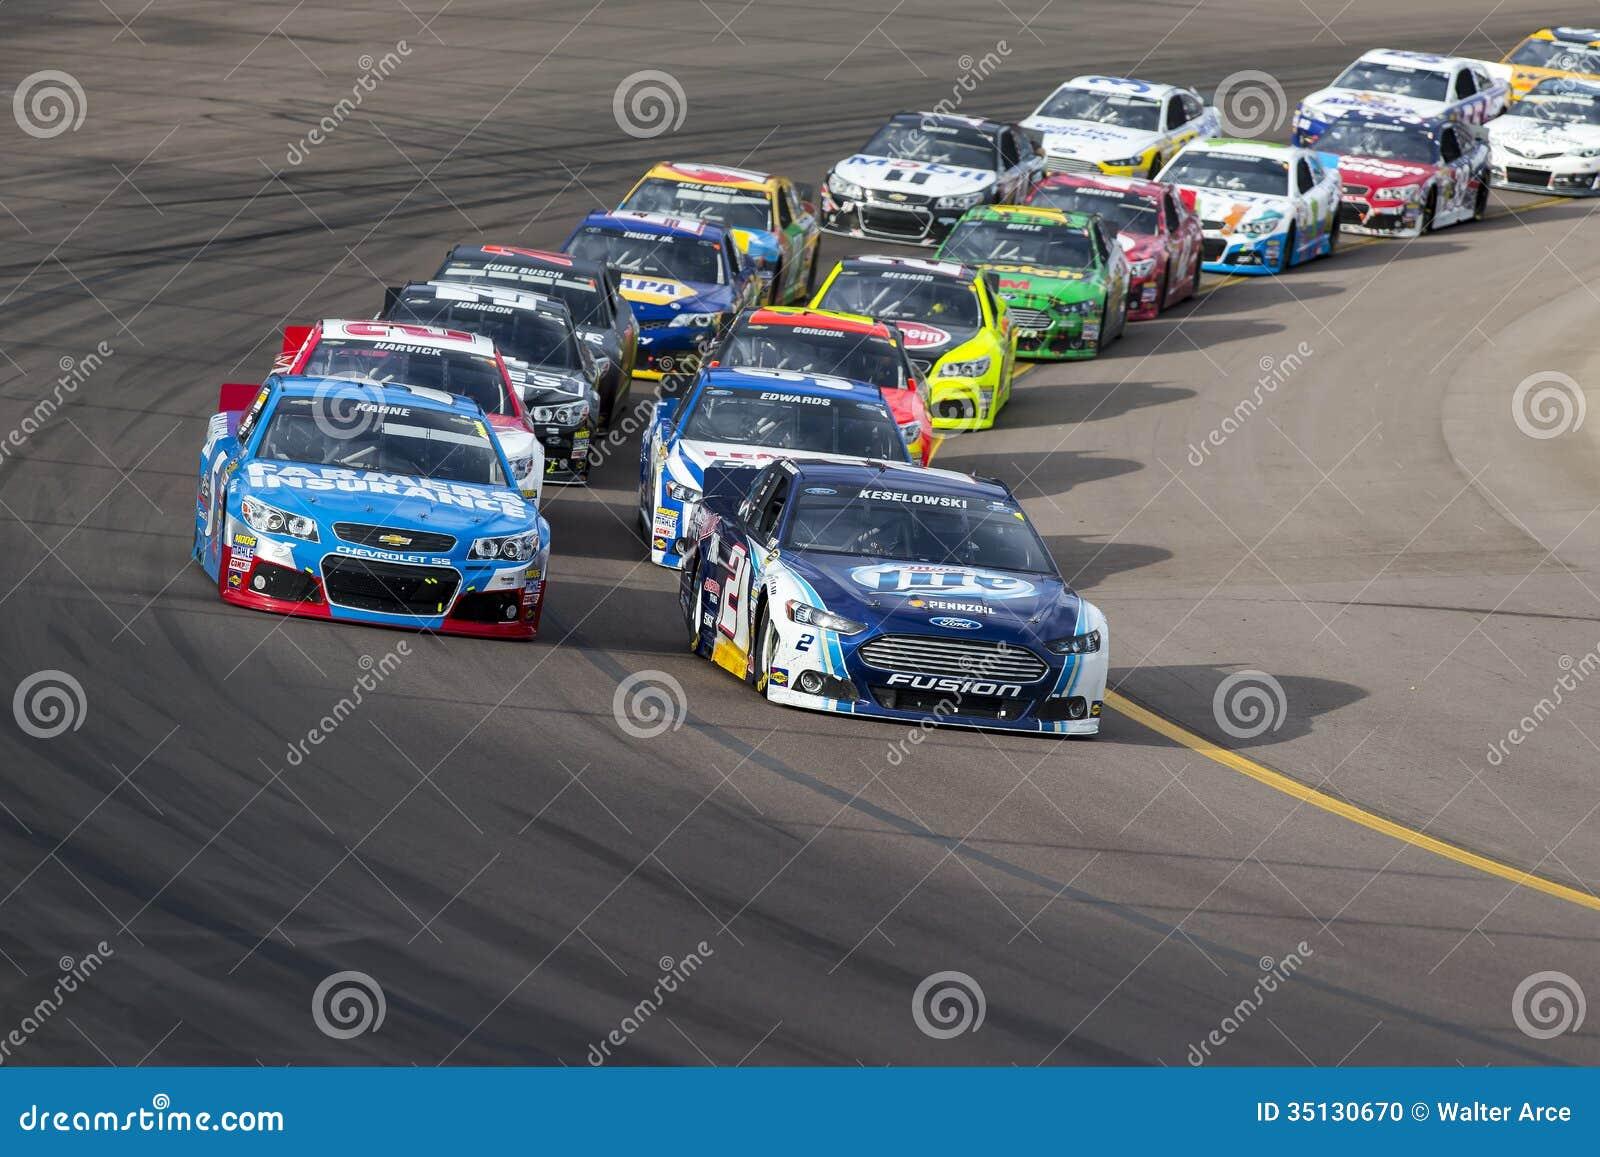 NASCAR 2013: Sprint Cup Series AdvoCare 500 November 10